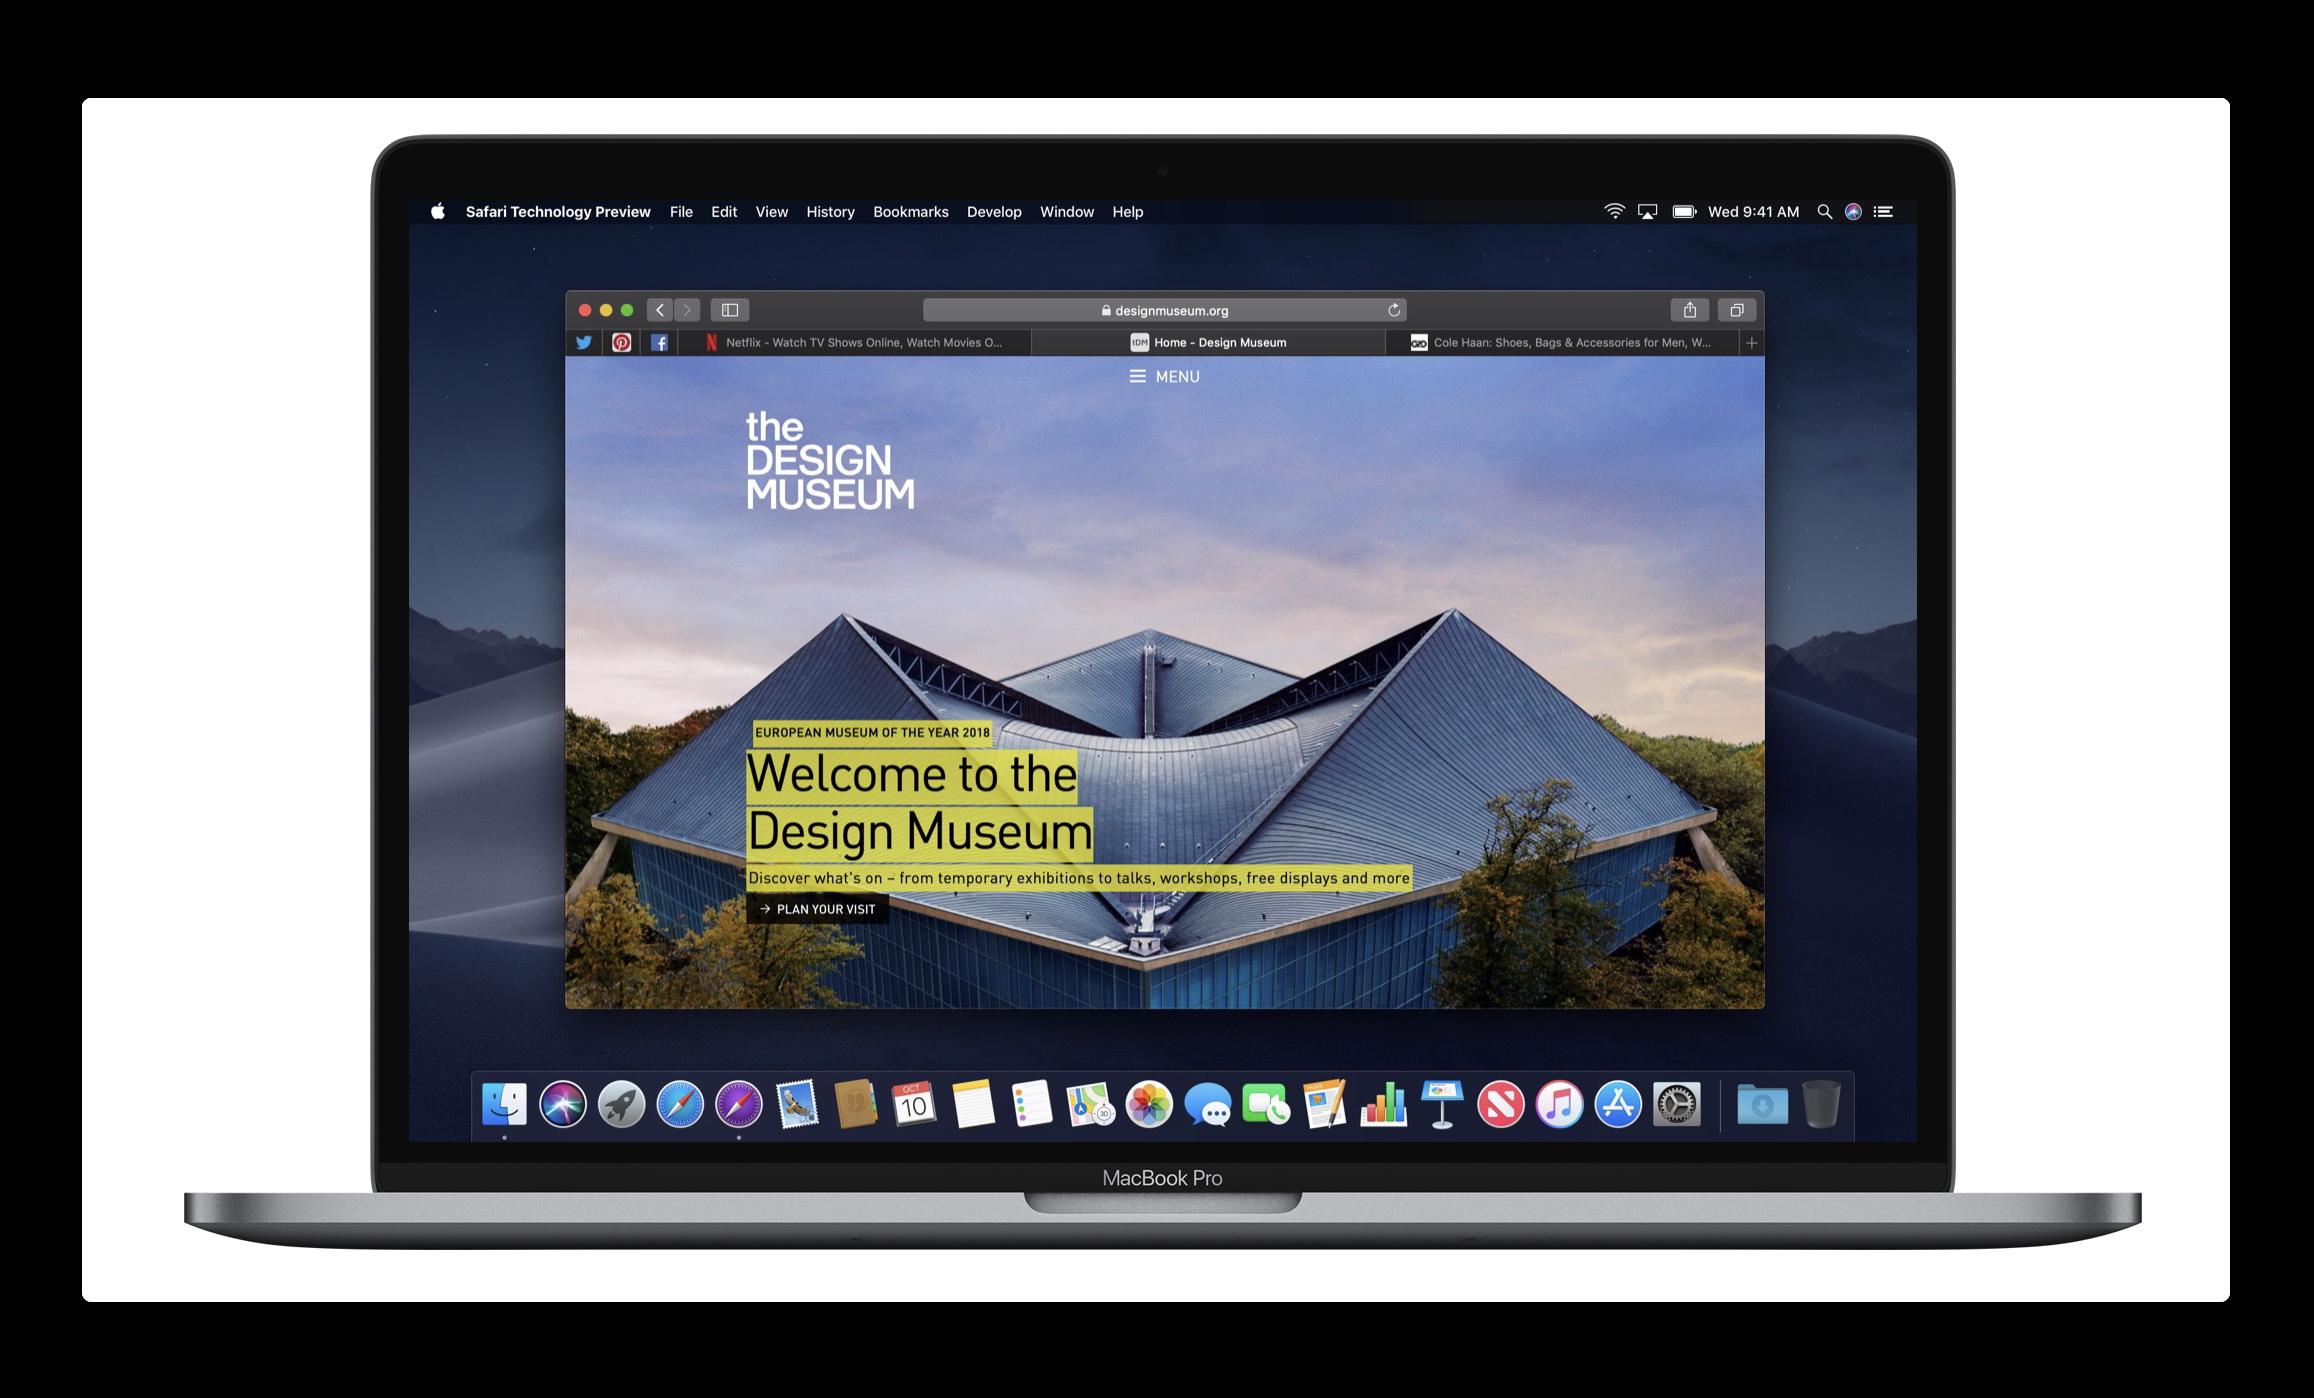 【Mac】Apple,「Safari Technology Preview Release 82」を開発者にリリース